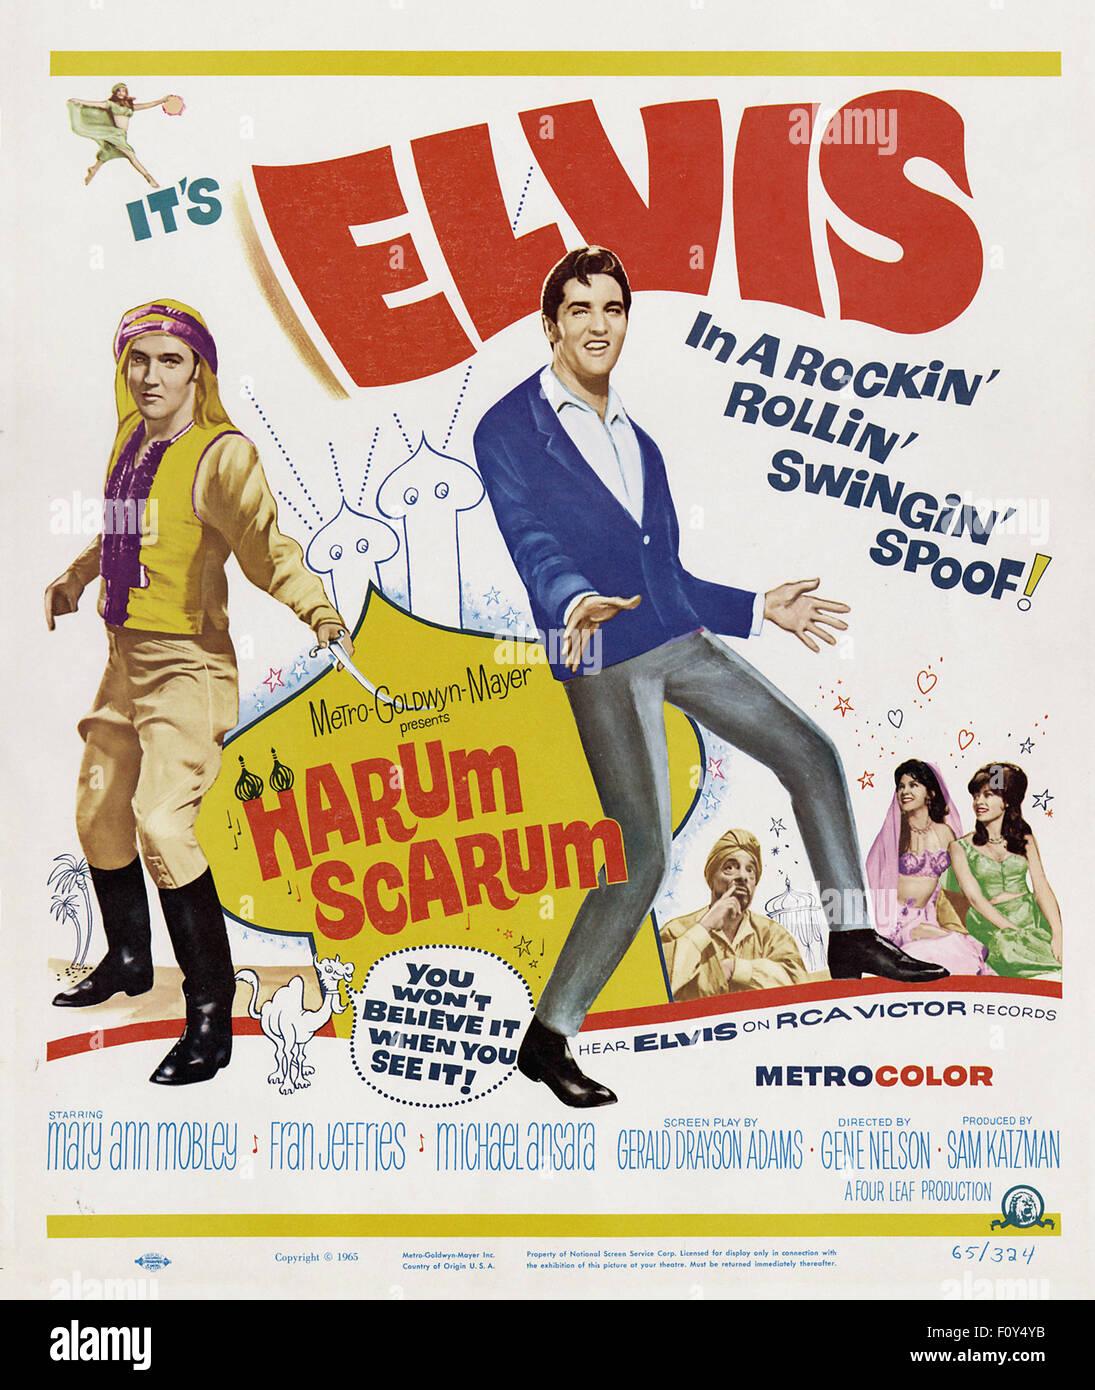 Harum Scarum - 20 - Movie Poster - Stock Image